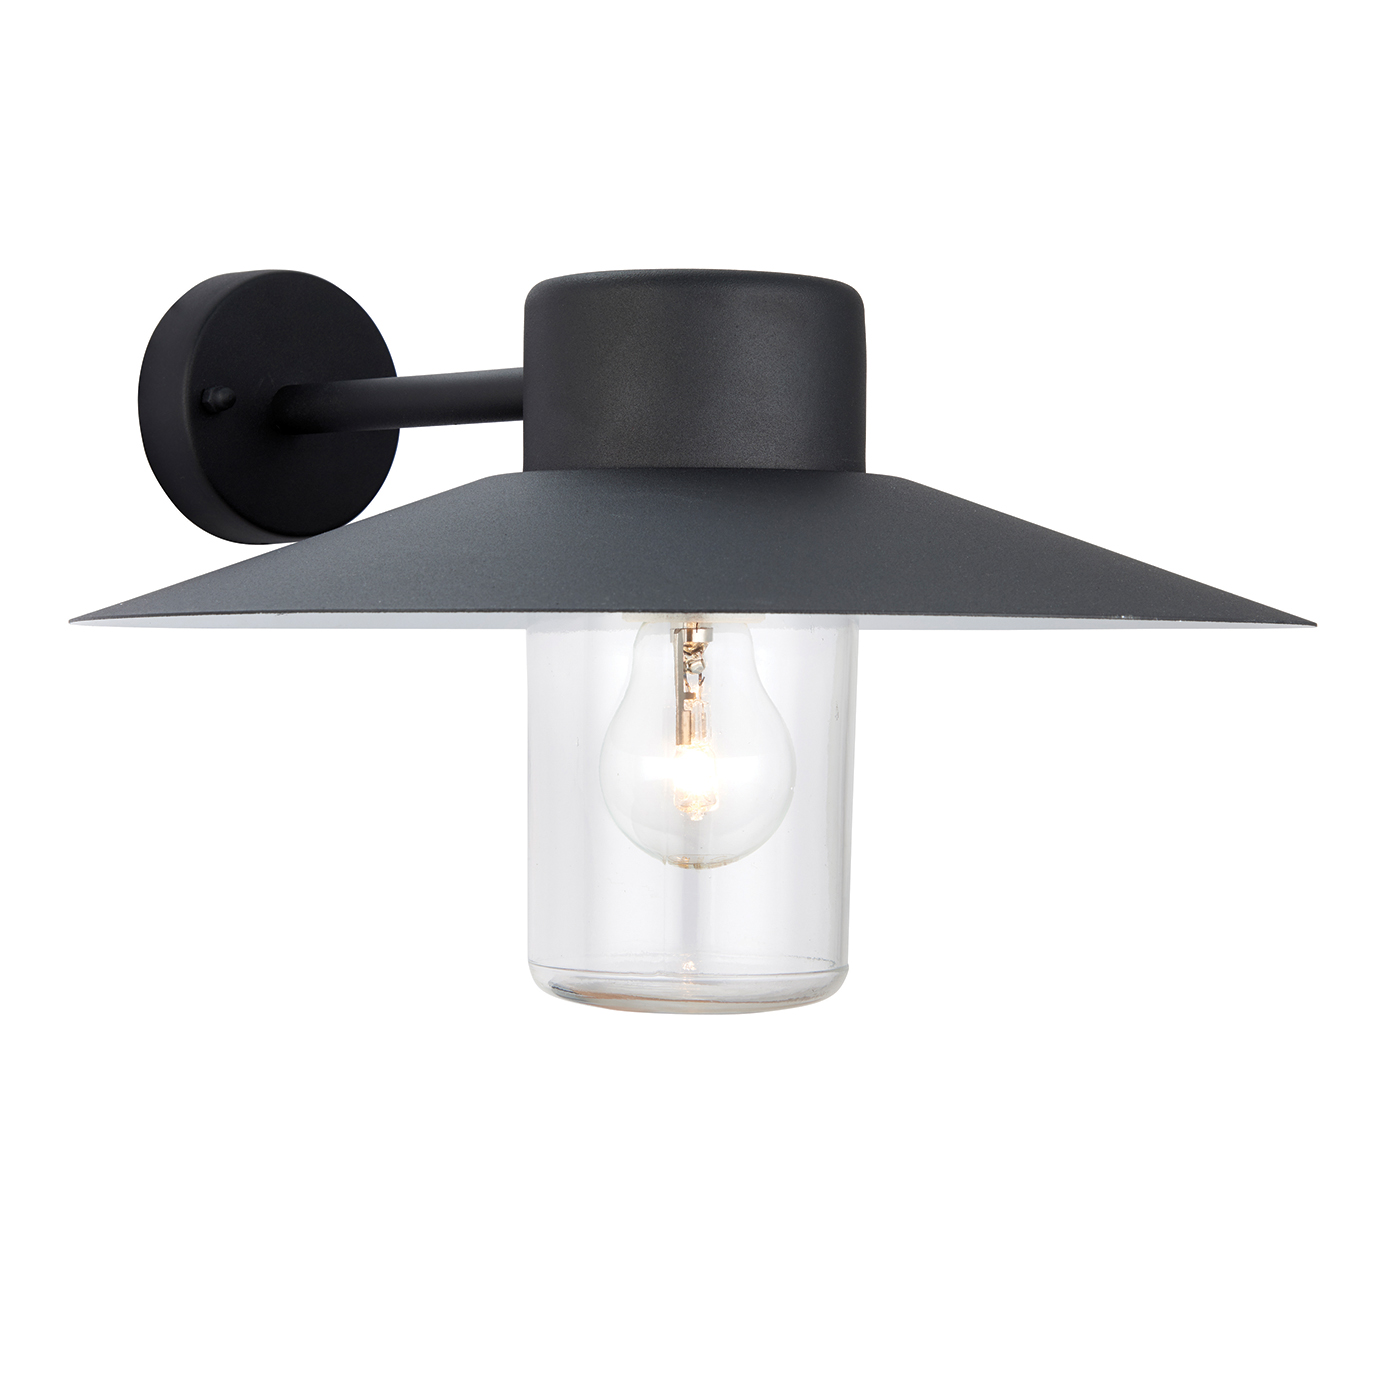 Outdoor Wall Light Accessories: Endon Fenwick Outdoor Wall Light IP44 40W Textured Black